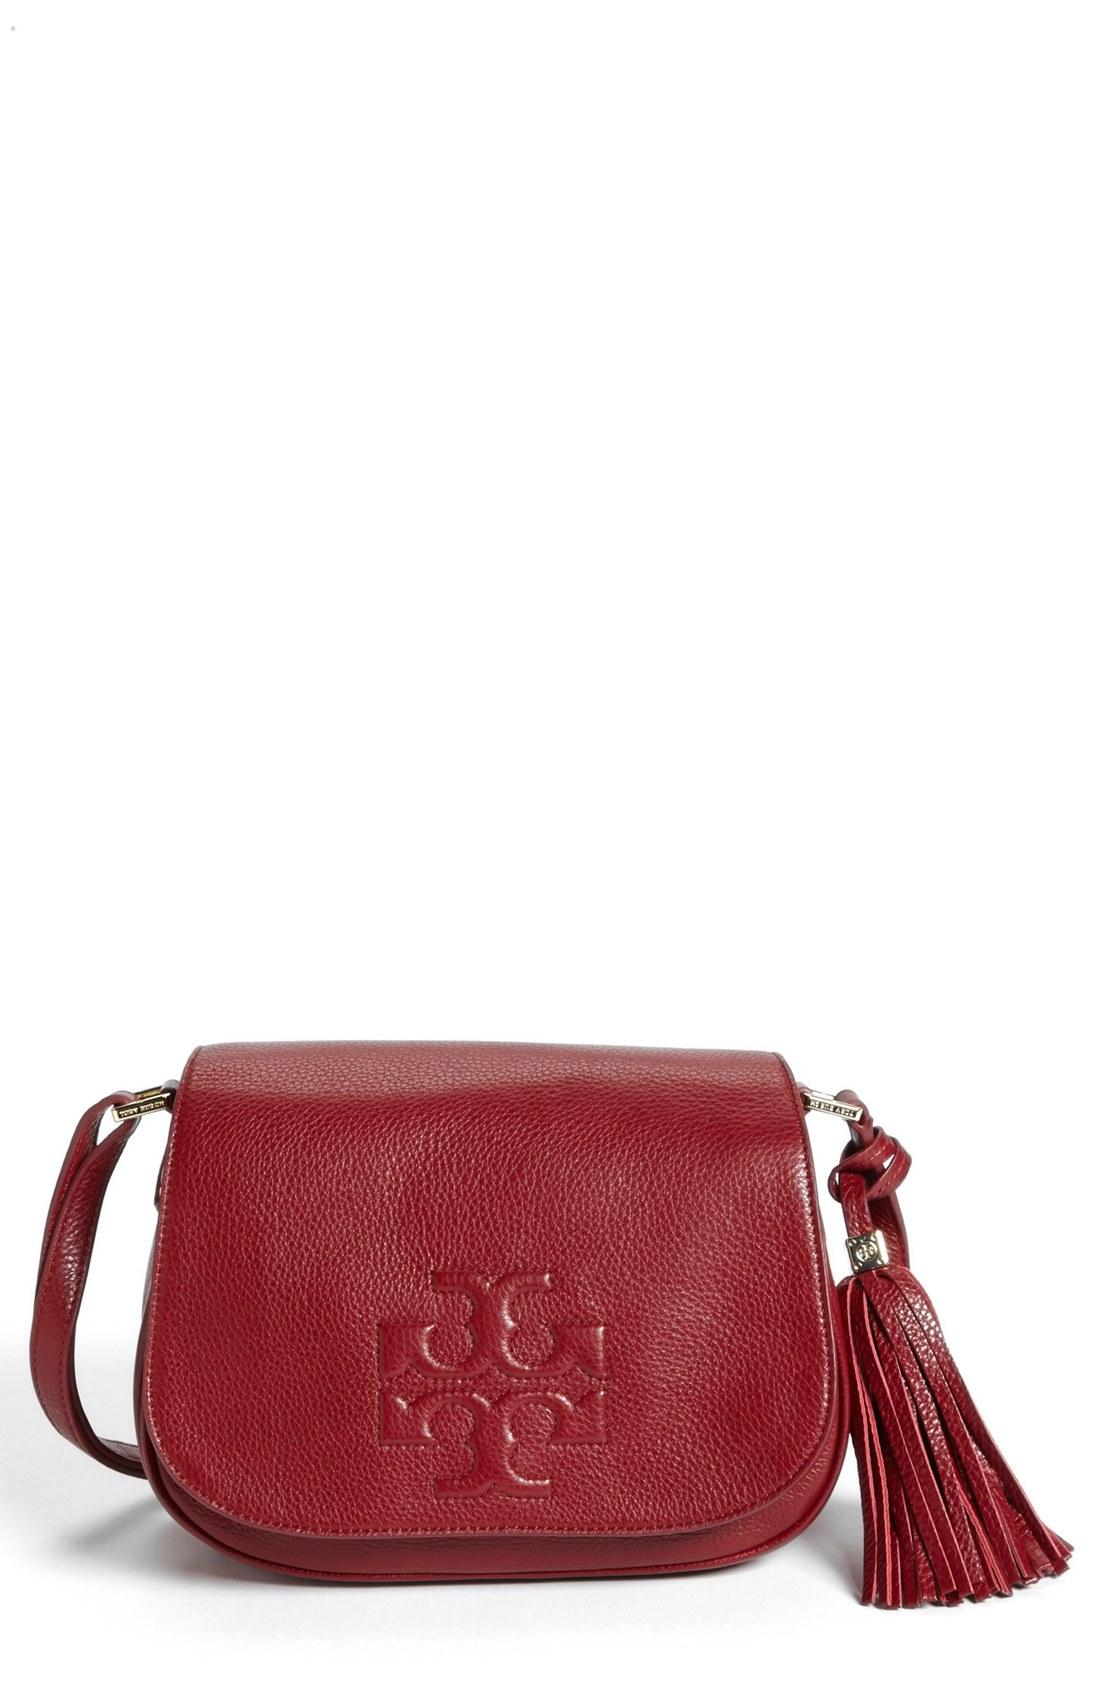 tory burch thea crossbody bag in red dark cherry lyst